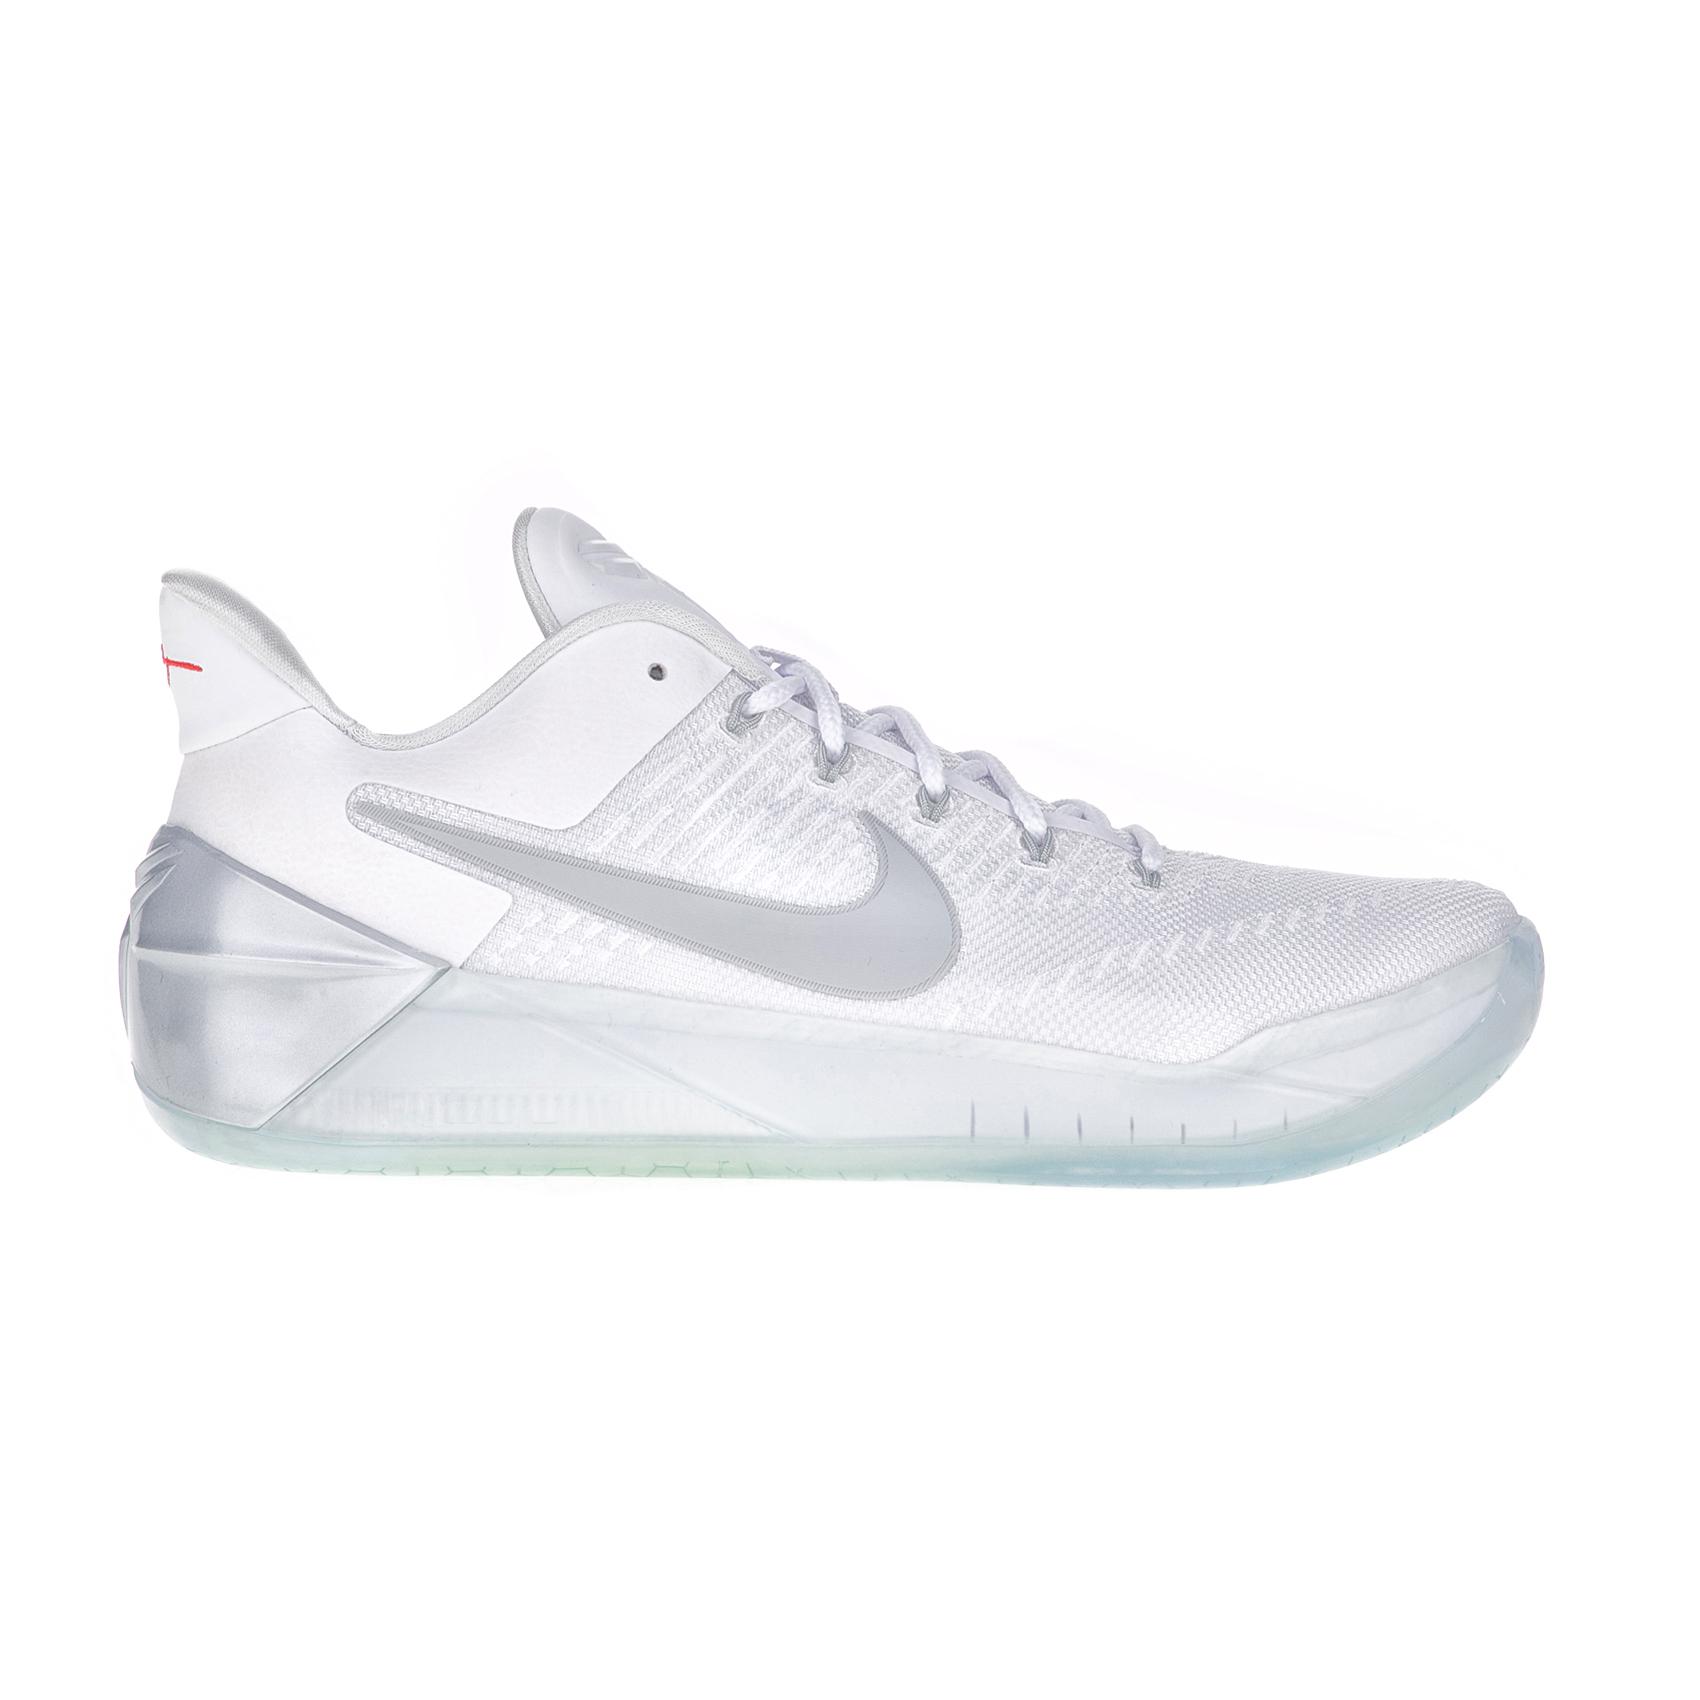 NIKE – Ανδρικά παπούτσια μπάσκετ ΝΙΚΕ KOBE A.D. λευκά